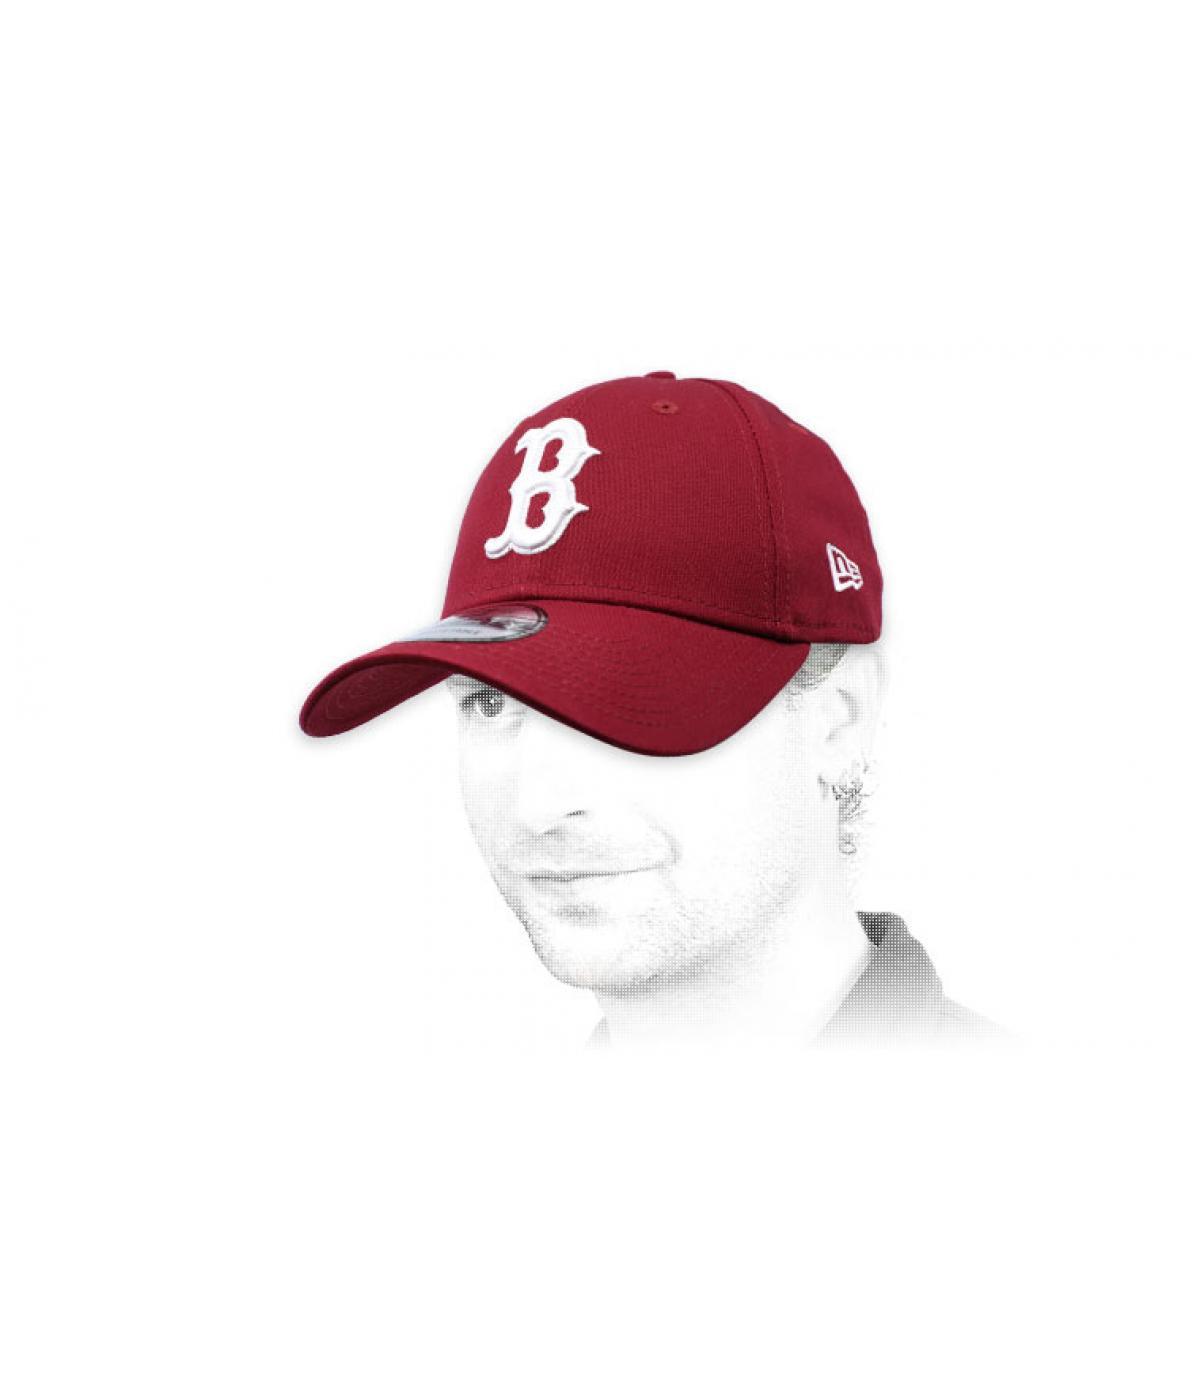 B burgundy curve cap